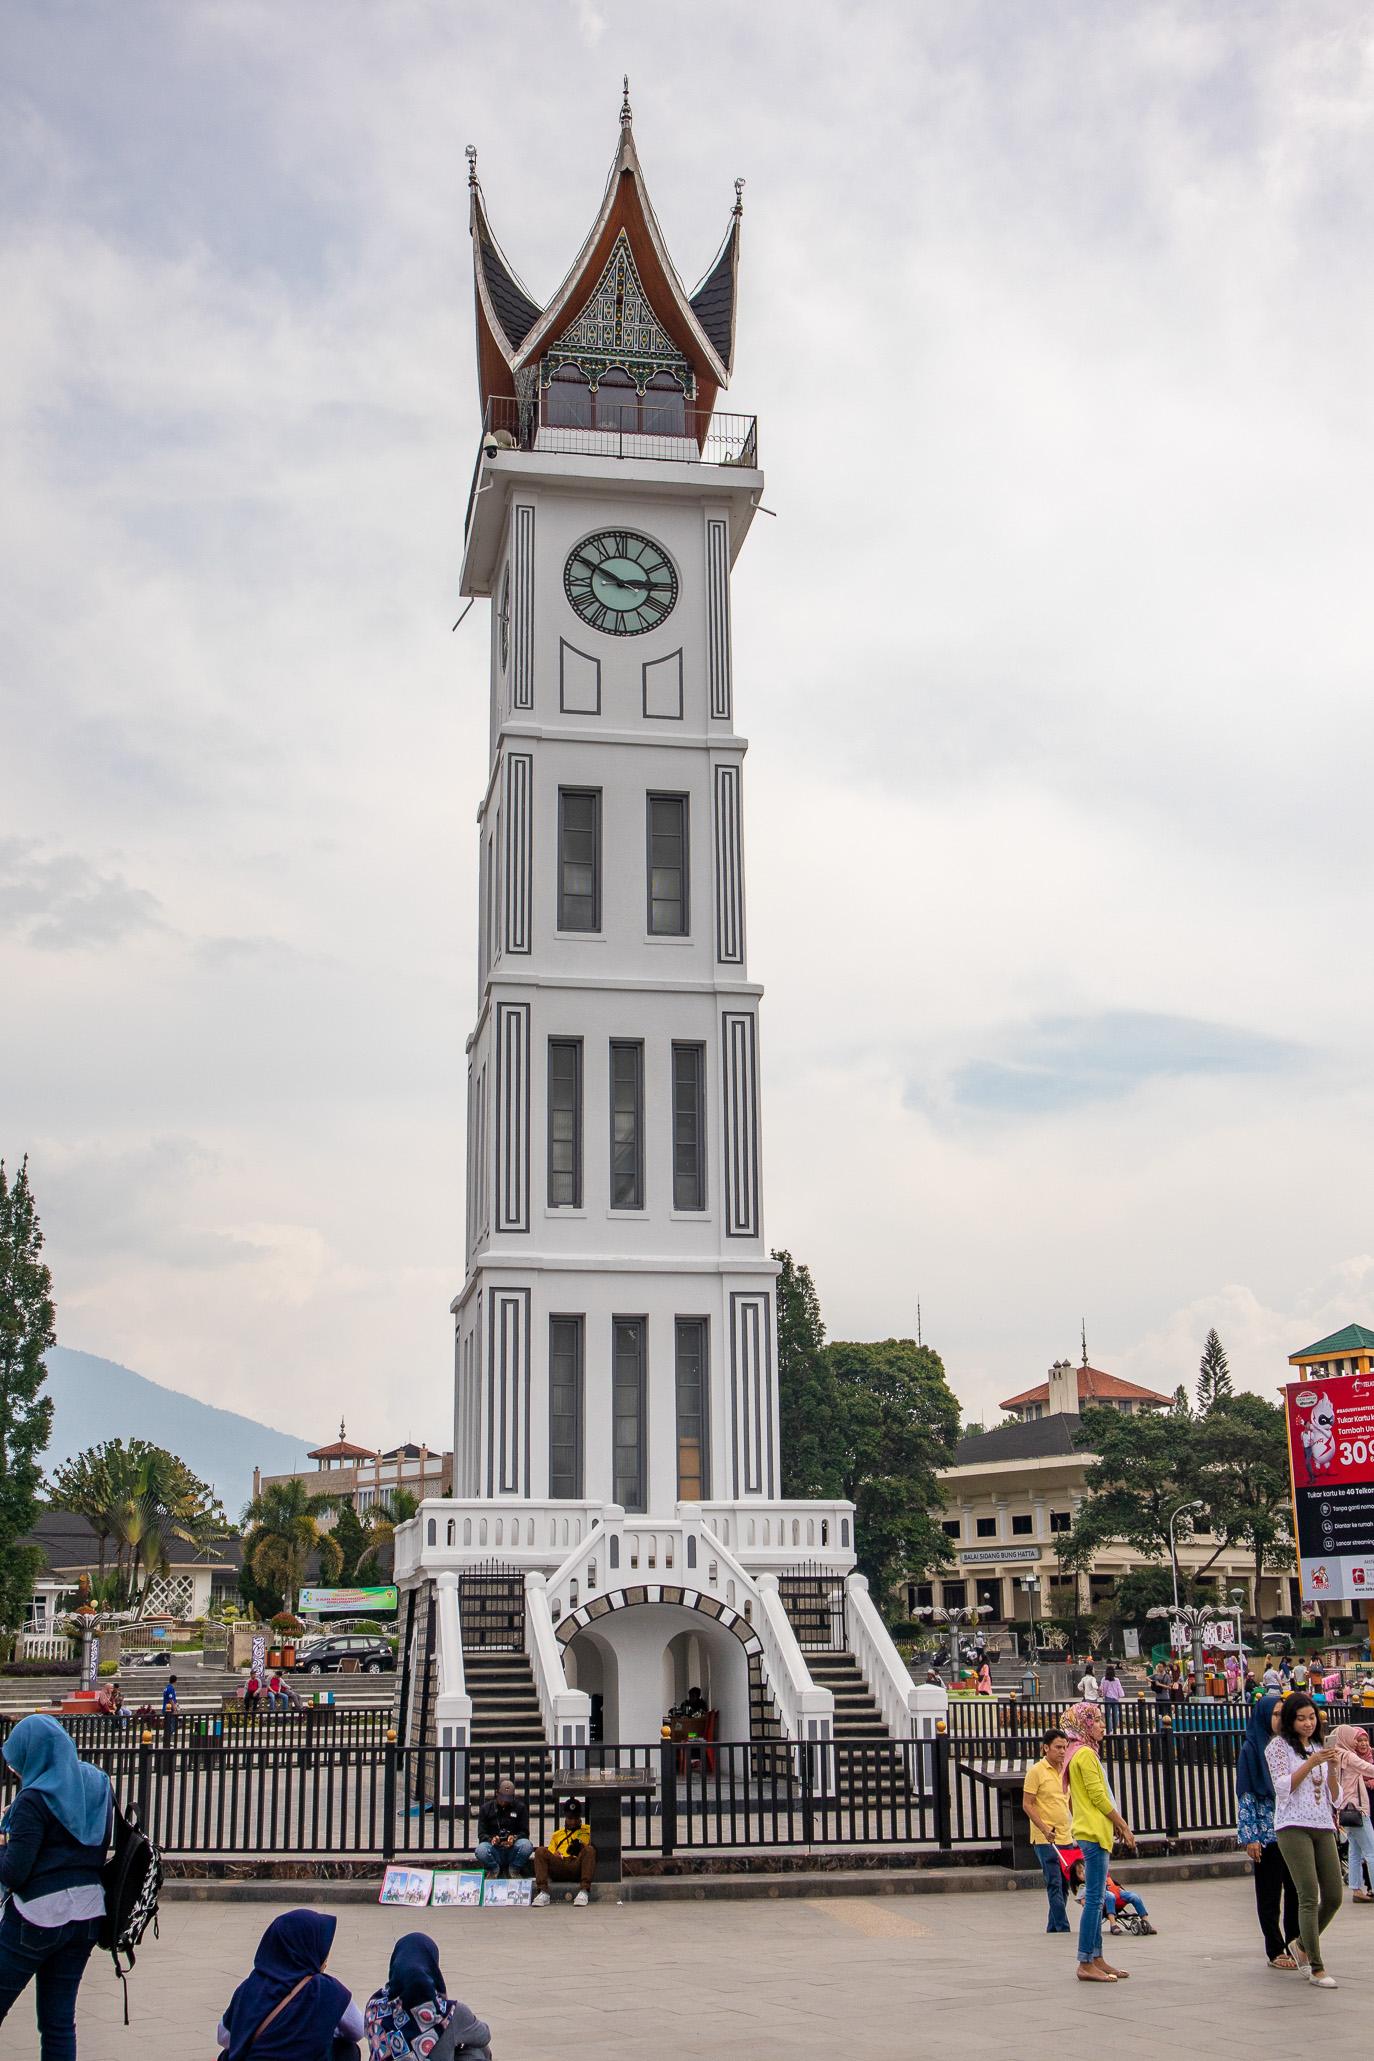 https://bubo.sk/uploads/galleries/7542/2ilmm__tomashornak_indonezia_sumatra_img_0266-1-2.jpg